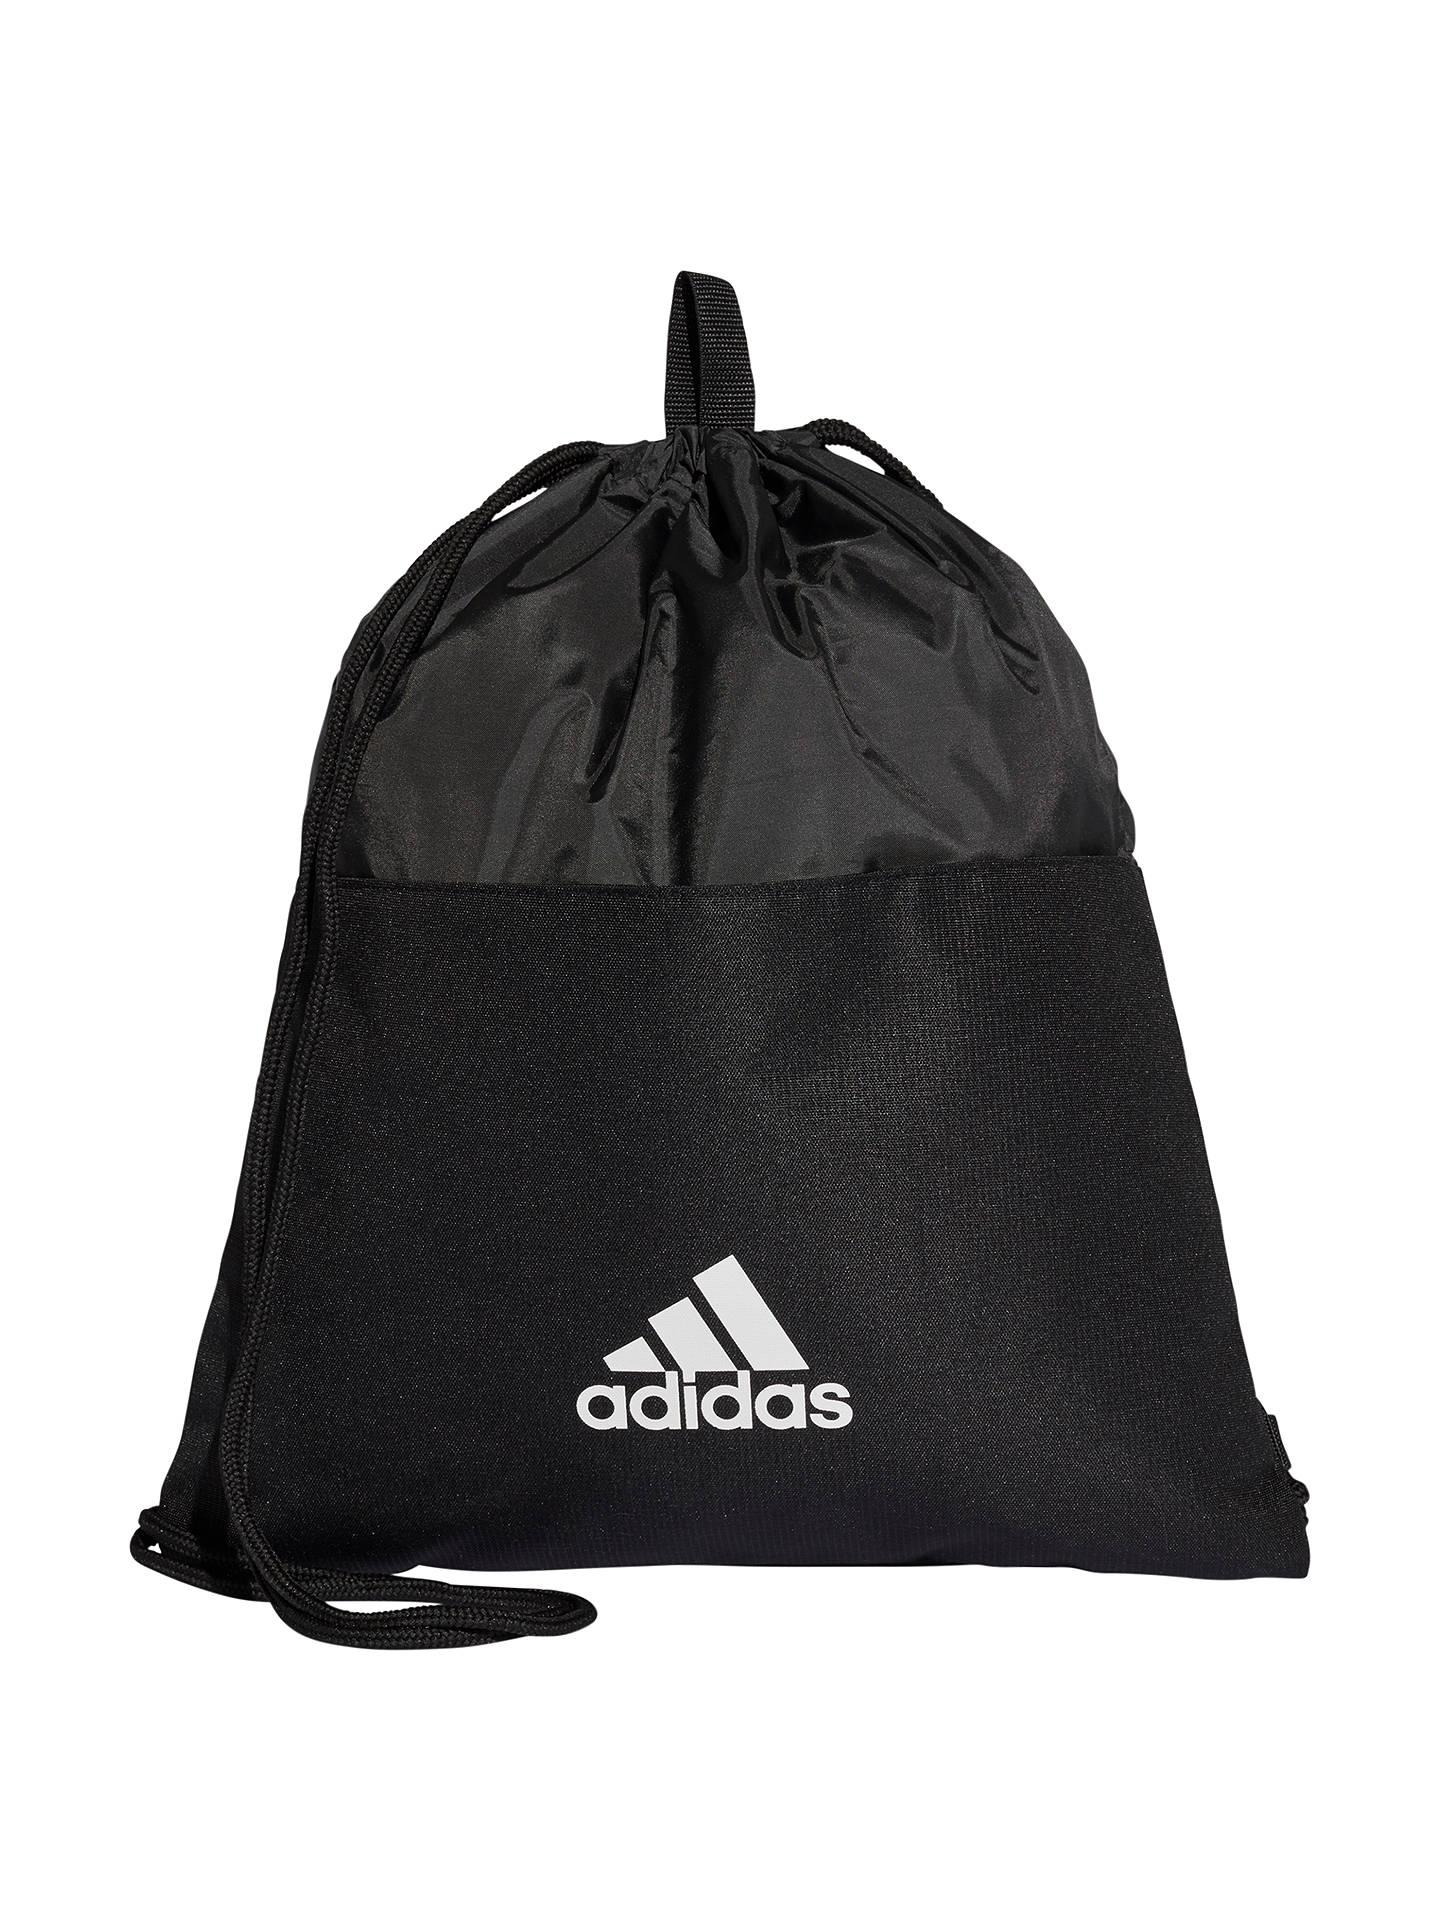 a0986fa45c Buy adidas Training Core Gym Bag